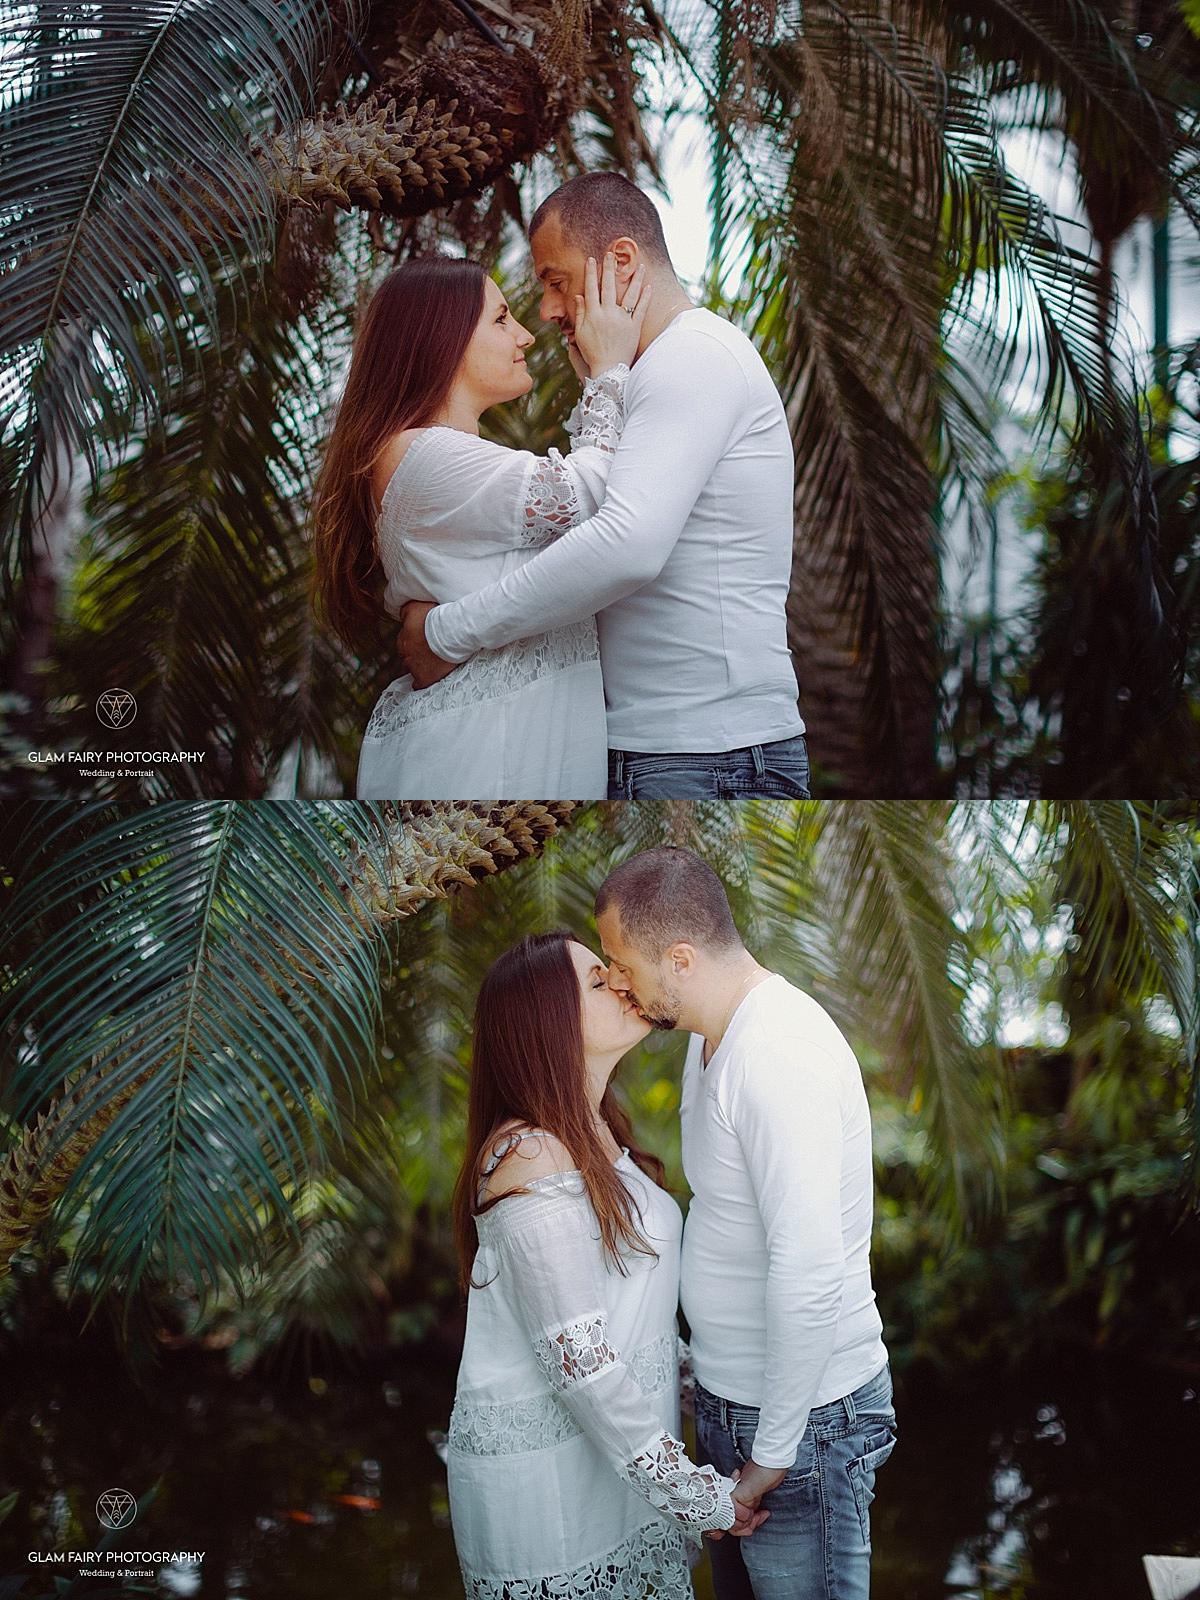 GlamFairyPhotography-seance-couple-famille-serres-auteuil-sonia_0011